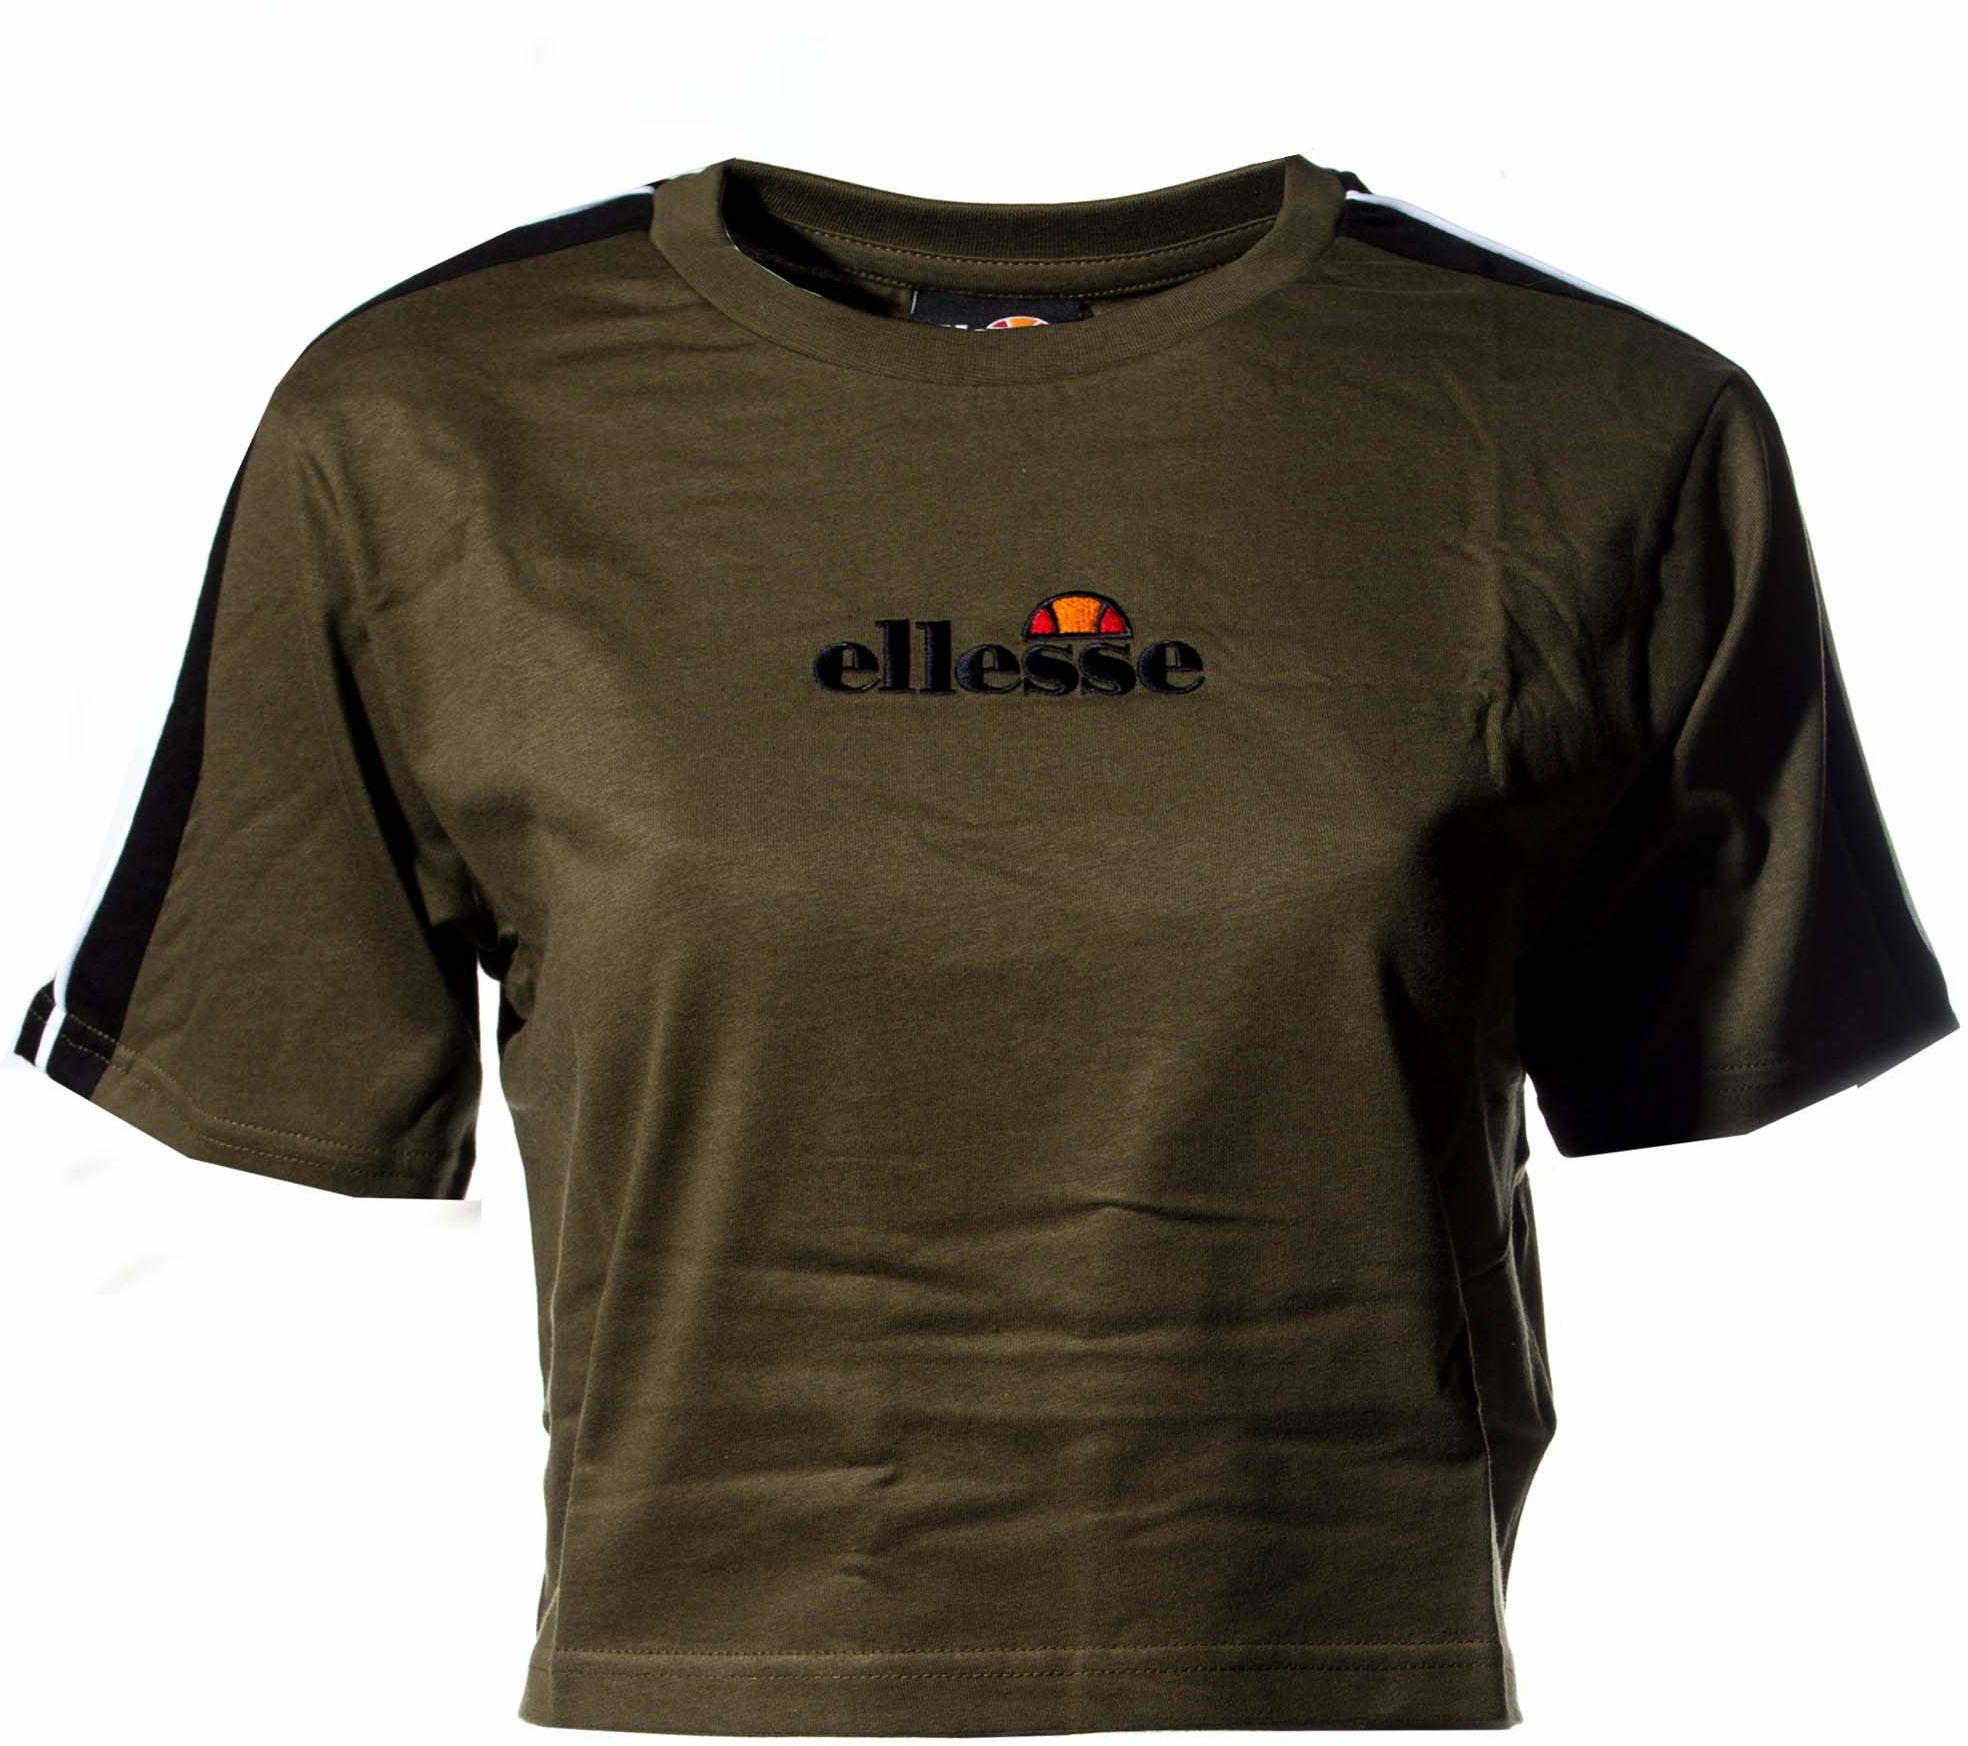 ellesse Damska koszulka Amarillo Khaki 10